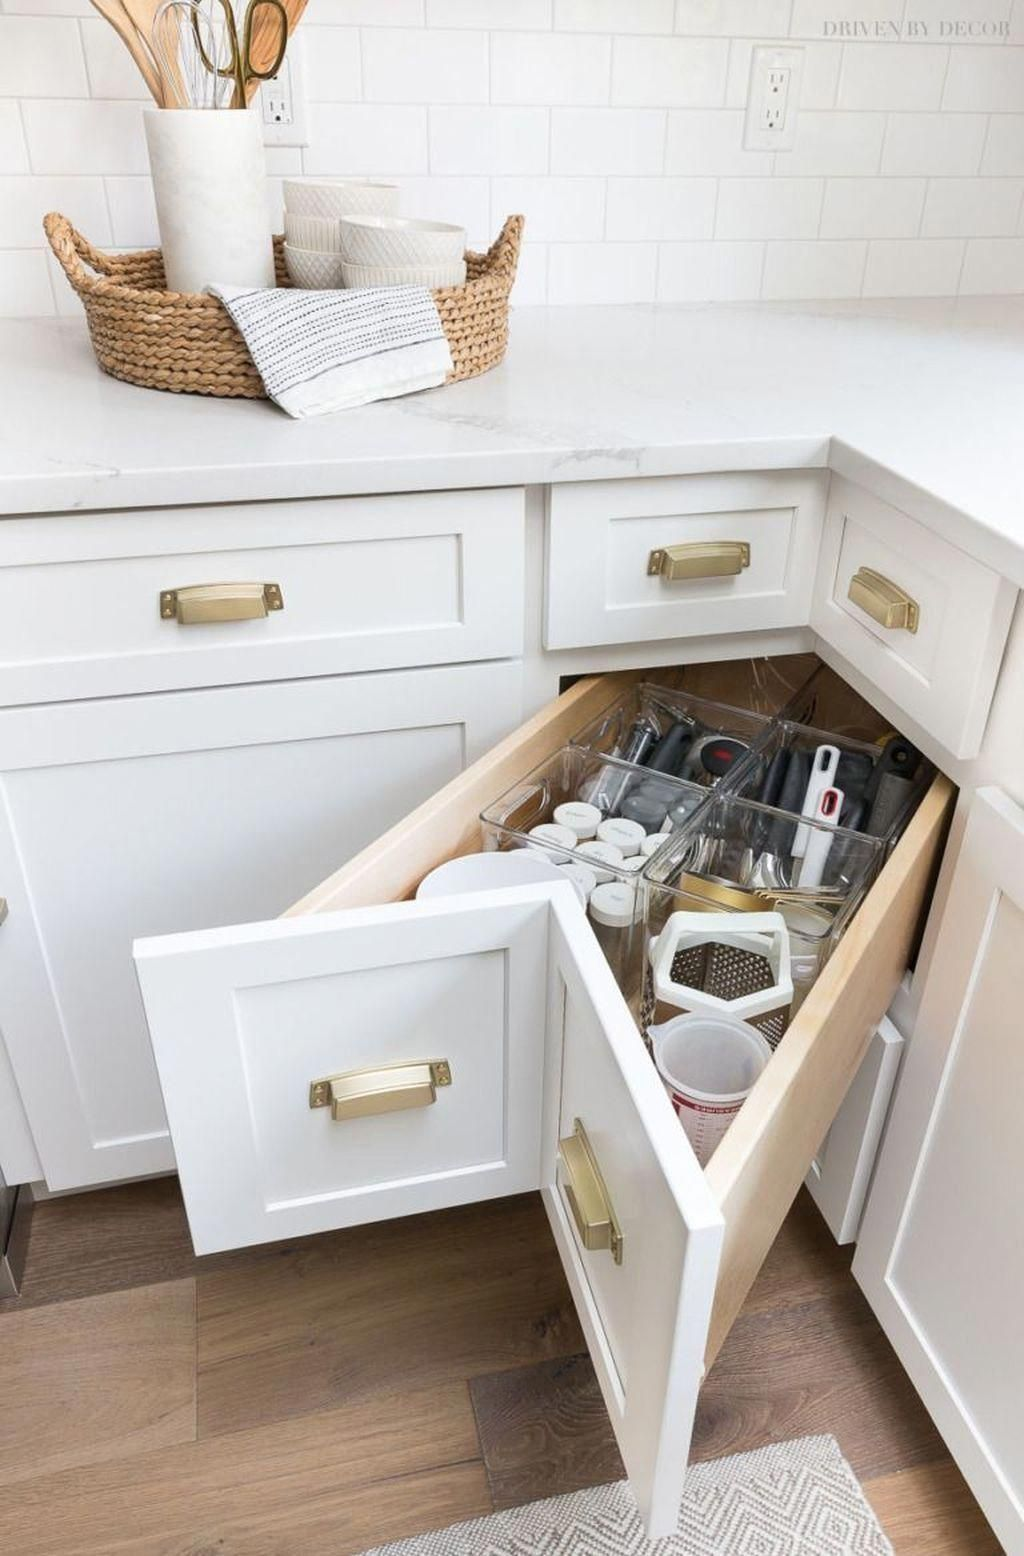 Cool 30 Luxury Kitchen Storage Ideas To Save Your Space Smallkitchen Kitchen Remodel Small Kitchen Design Small Small Kitchen Storage